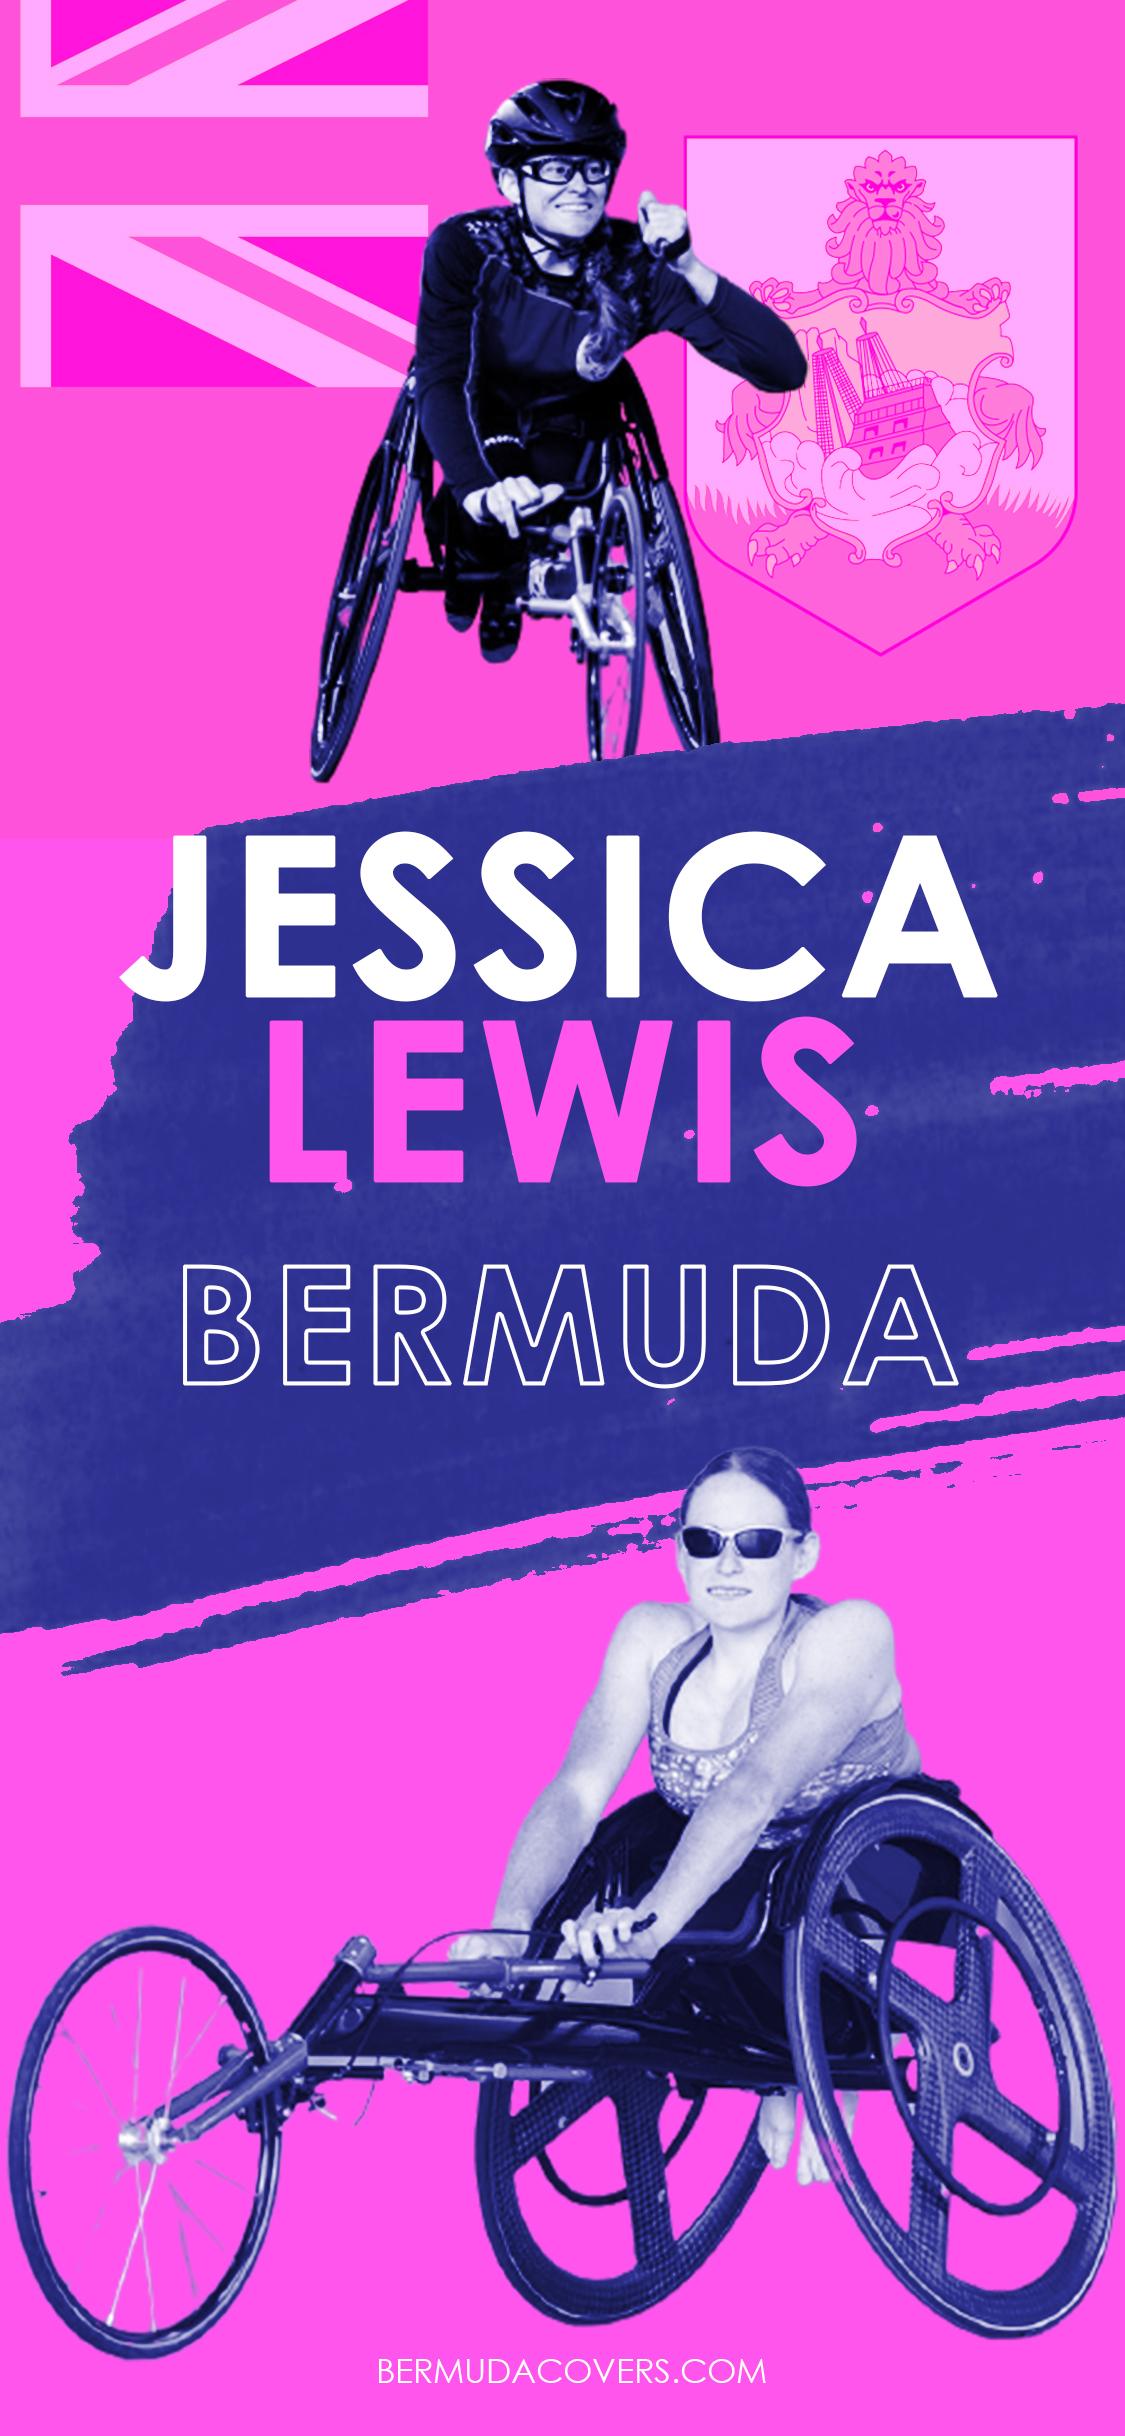 Jessica-Lewis-BBermuda Bernews Mobile Phone Wallpaper Lock Screen Design Image Photo